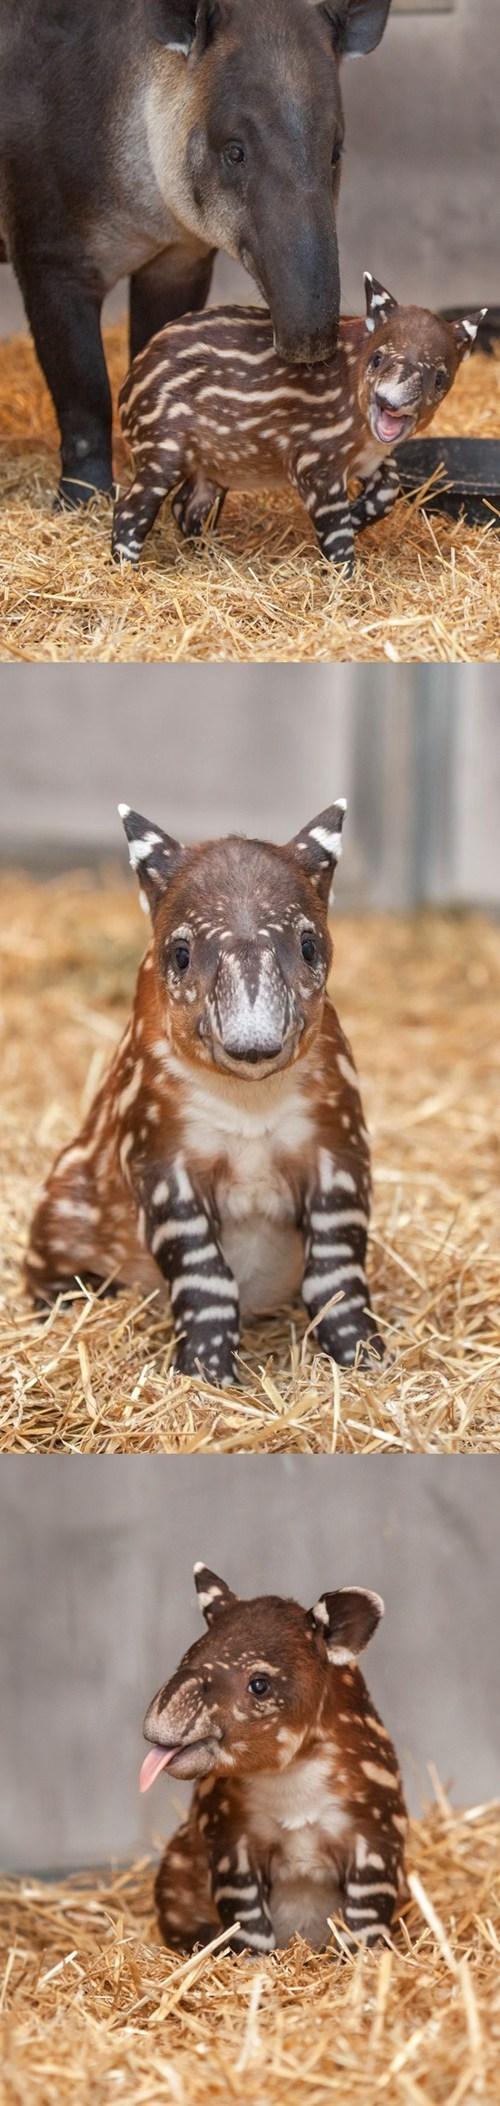 photoset baby cute tapir squee - 7019565824